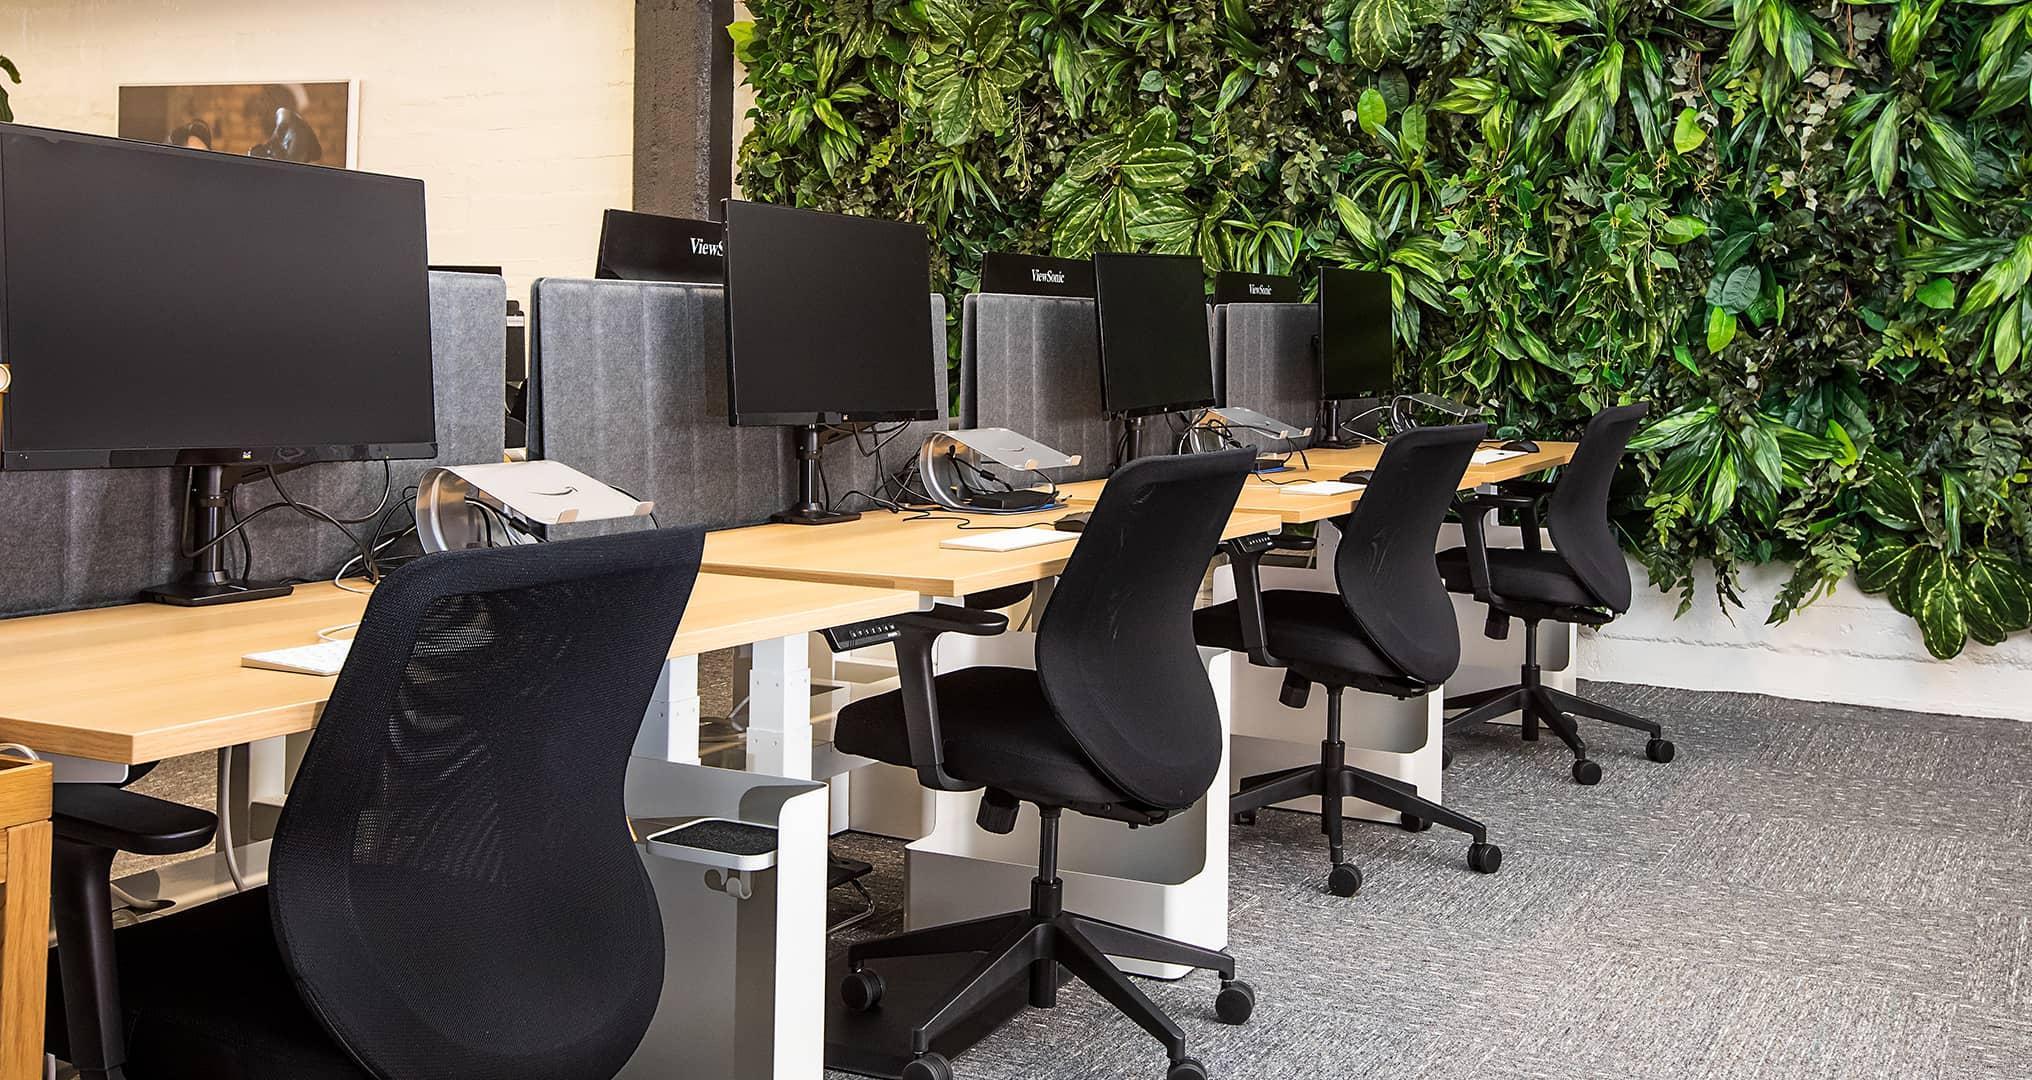 Office desks with ergonomic desk chairs